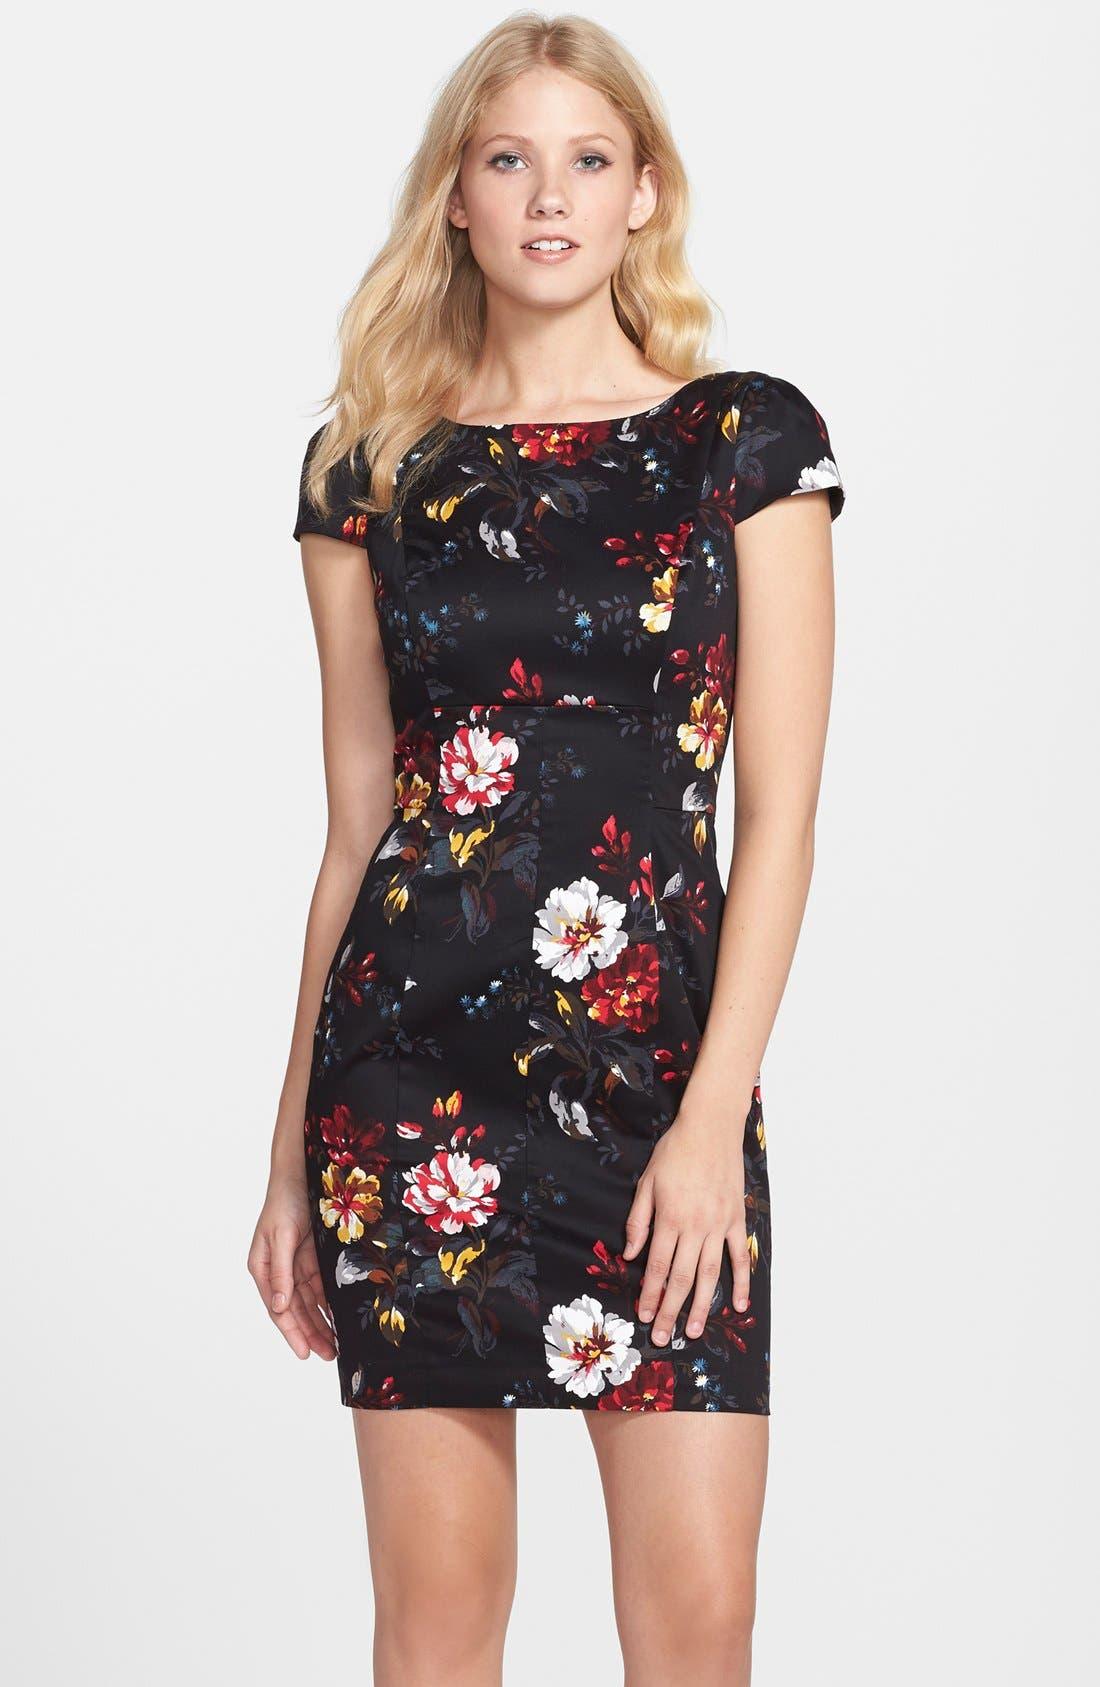 'Gardini' Floral Print Cotton Sheath Dress,                             Main thumbnail 1, color,                             006